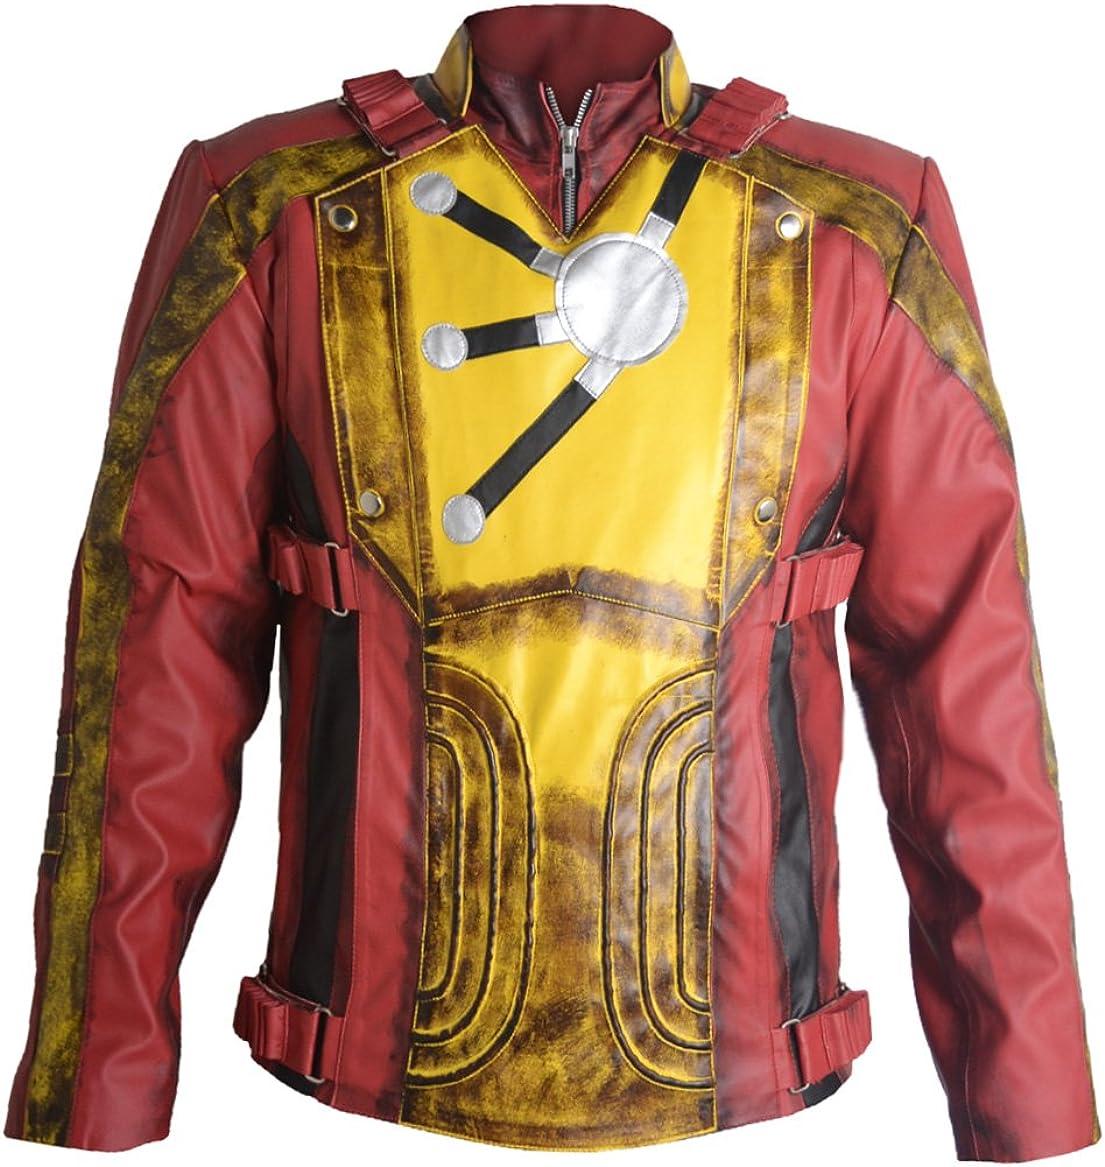 coolhides Men's Firestorm Fashion Legends of Tomorrow Leather Jacket